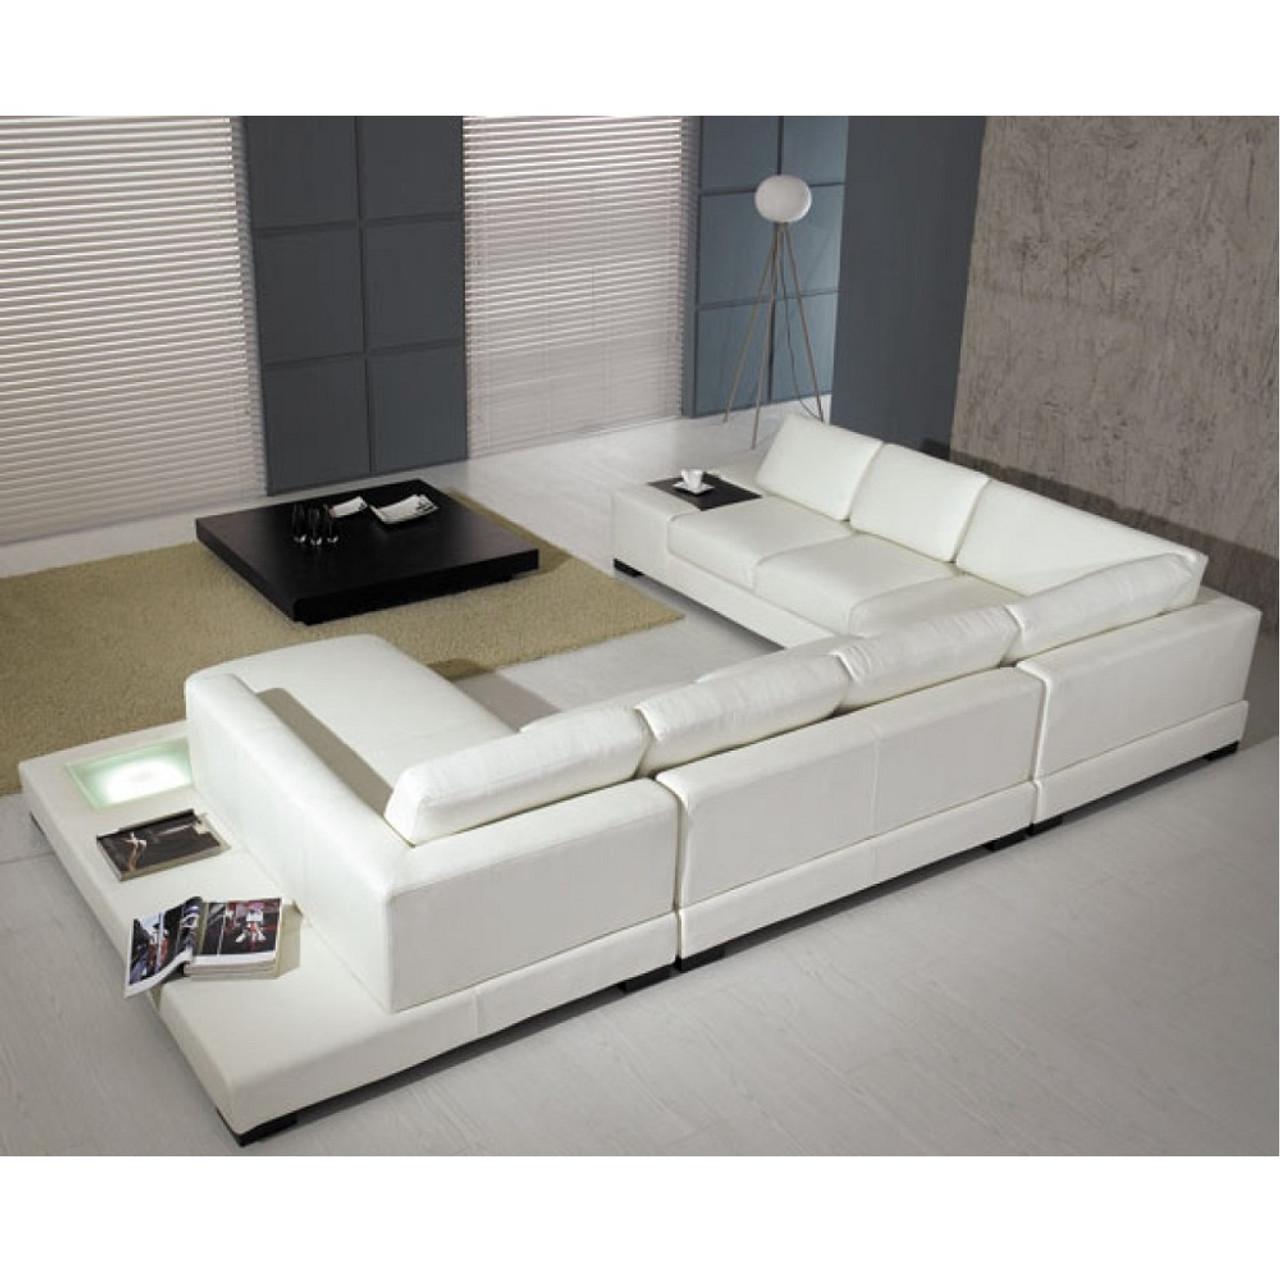 White Leather Sectional Sofa divani casa t35 - white leather sectional sofa with light